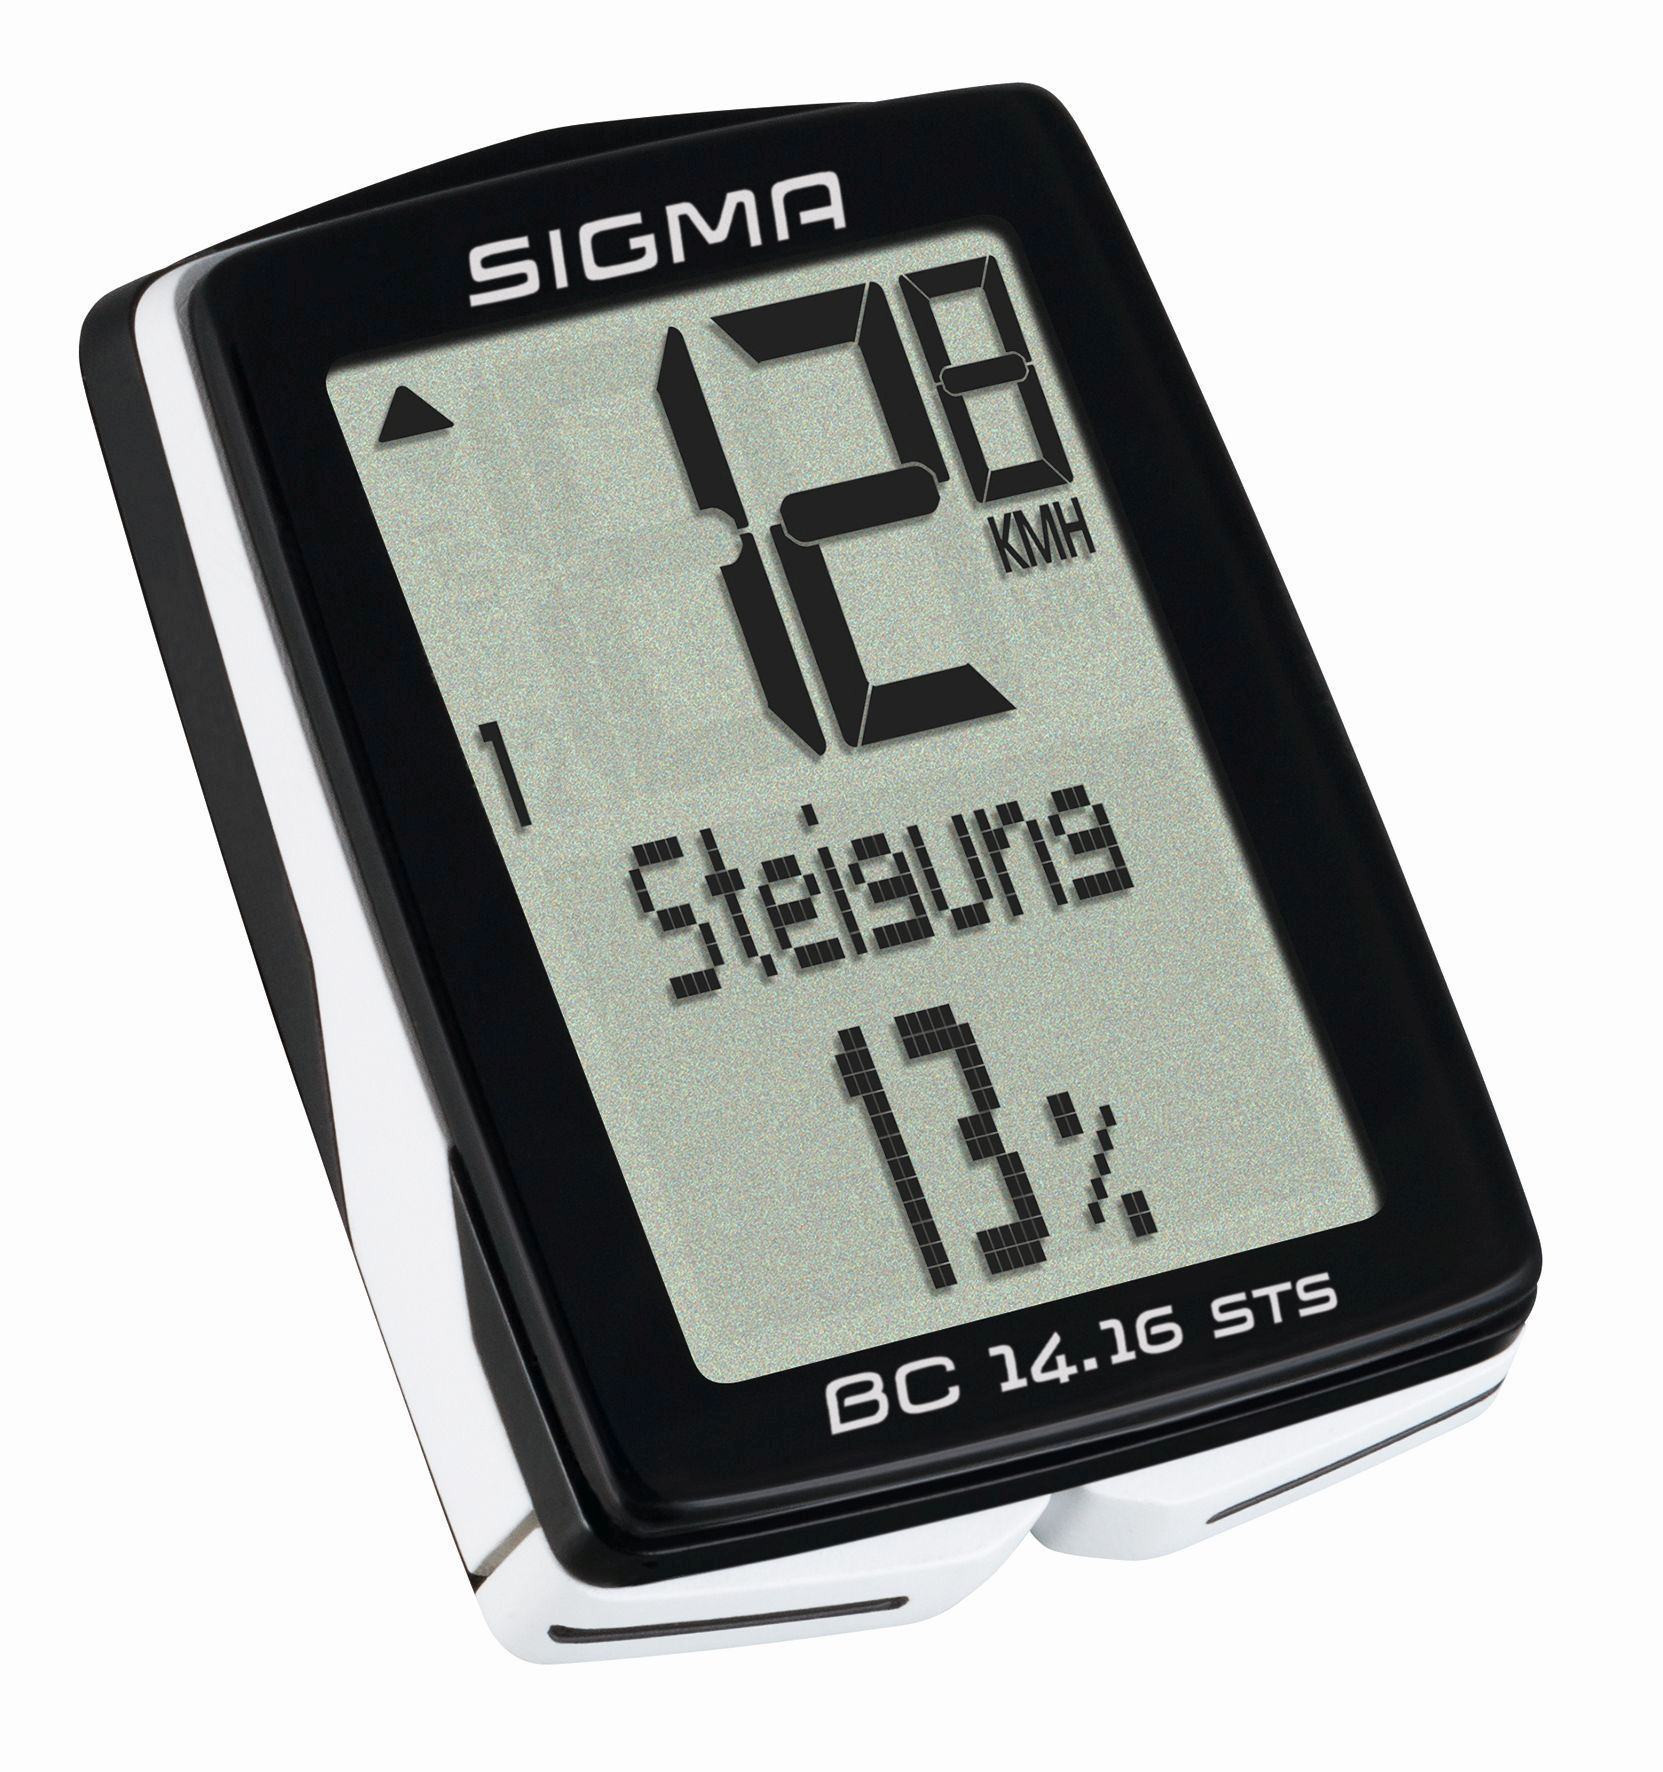 computer drahtlos: Sigma  BC 14.16 STS CAD wireless Computer